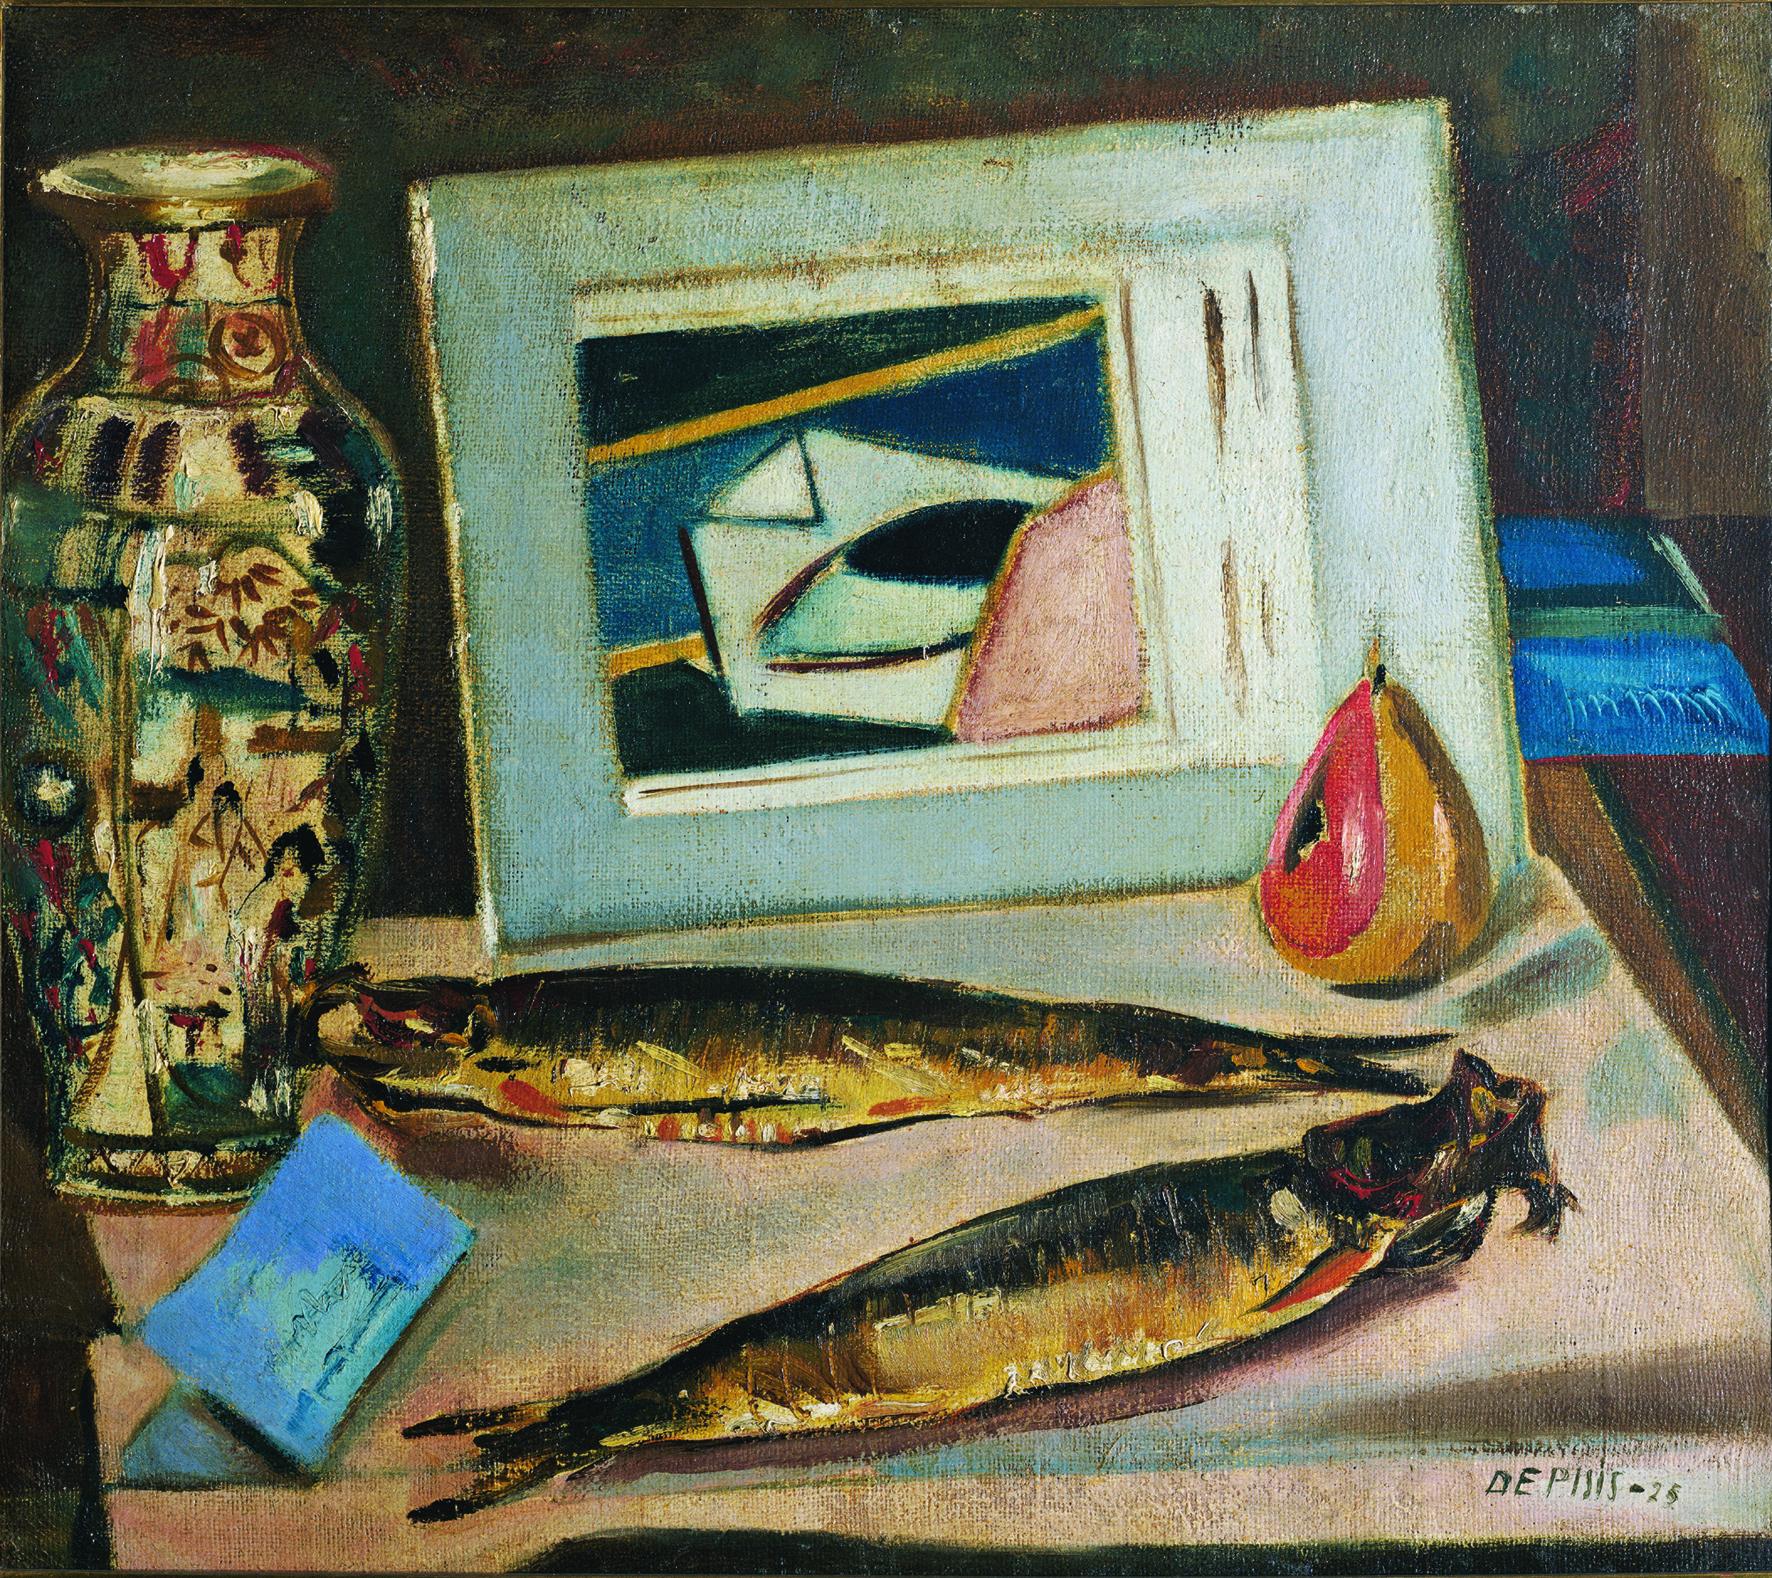 Filippo de Pisis, I pesci sacri